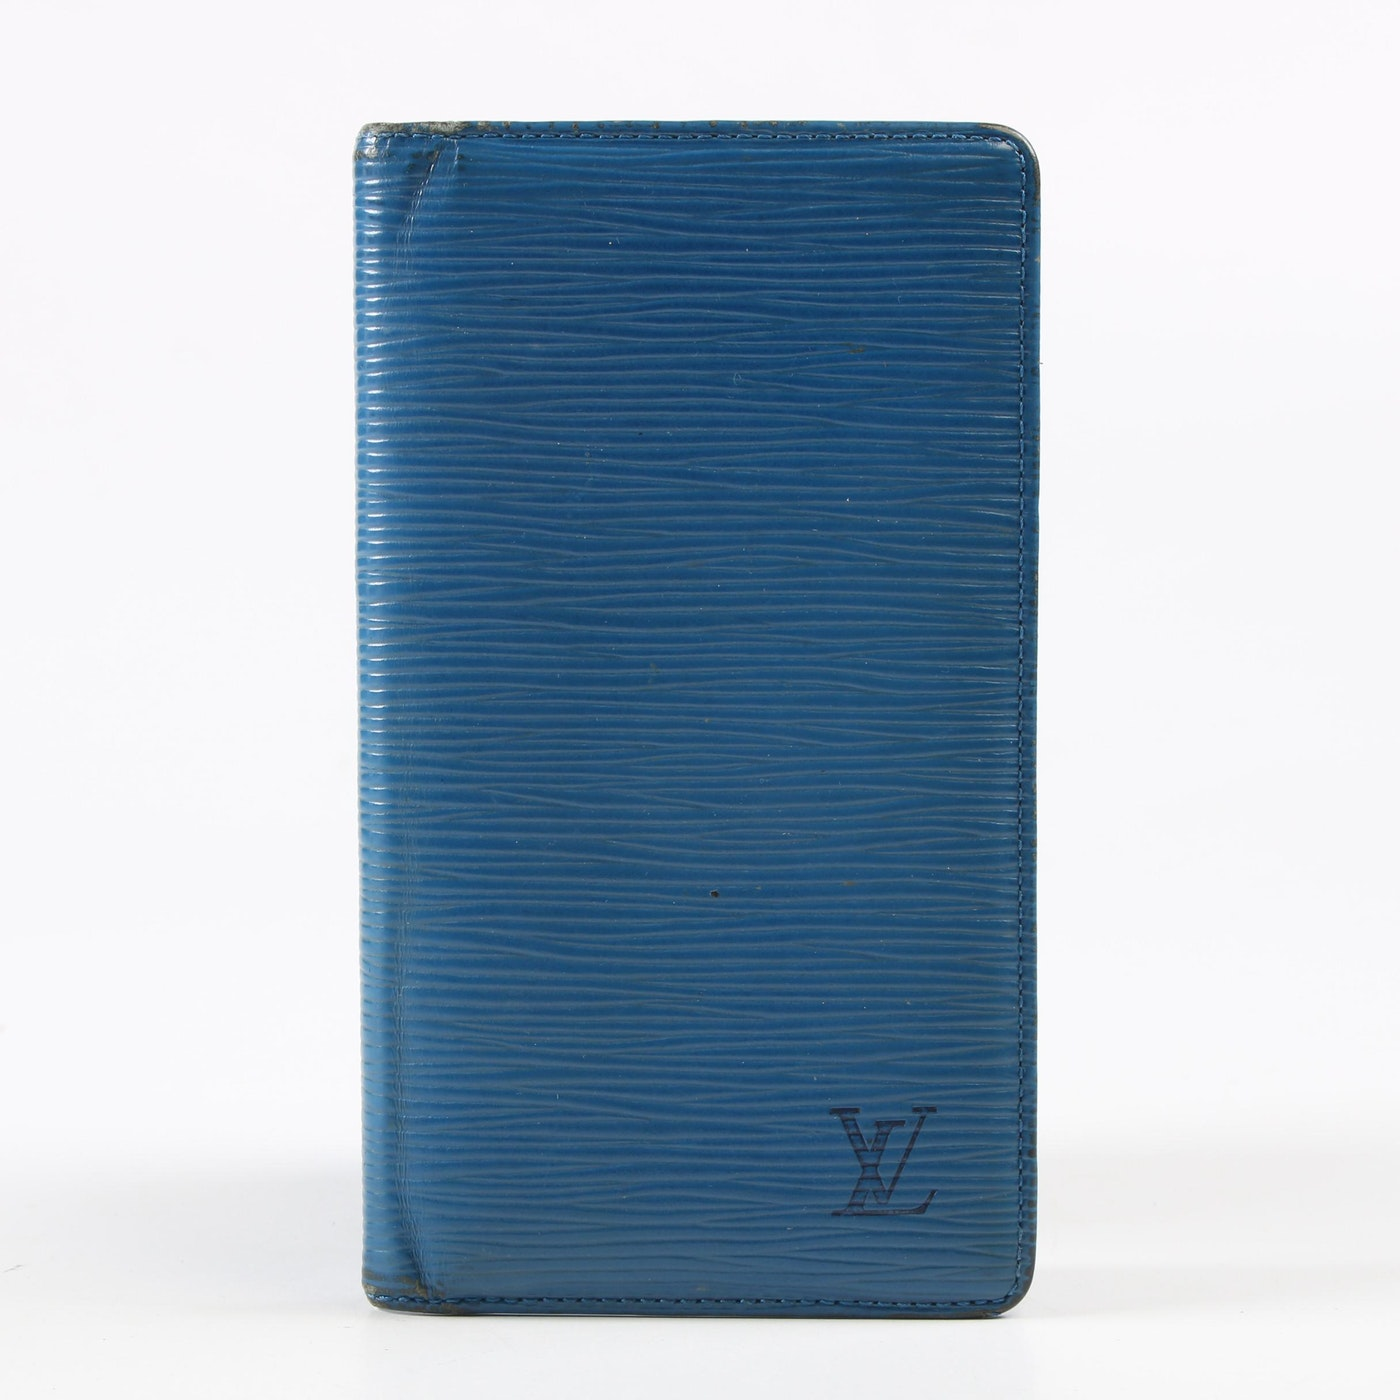 Louis Vuitton Epi Bifold Wallet - Mens Accessories